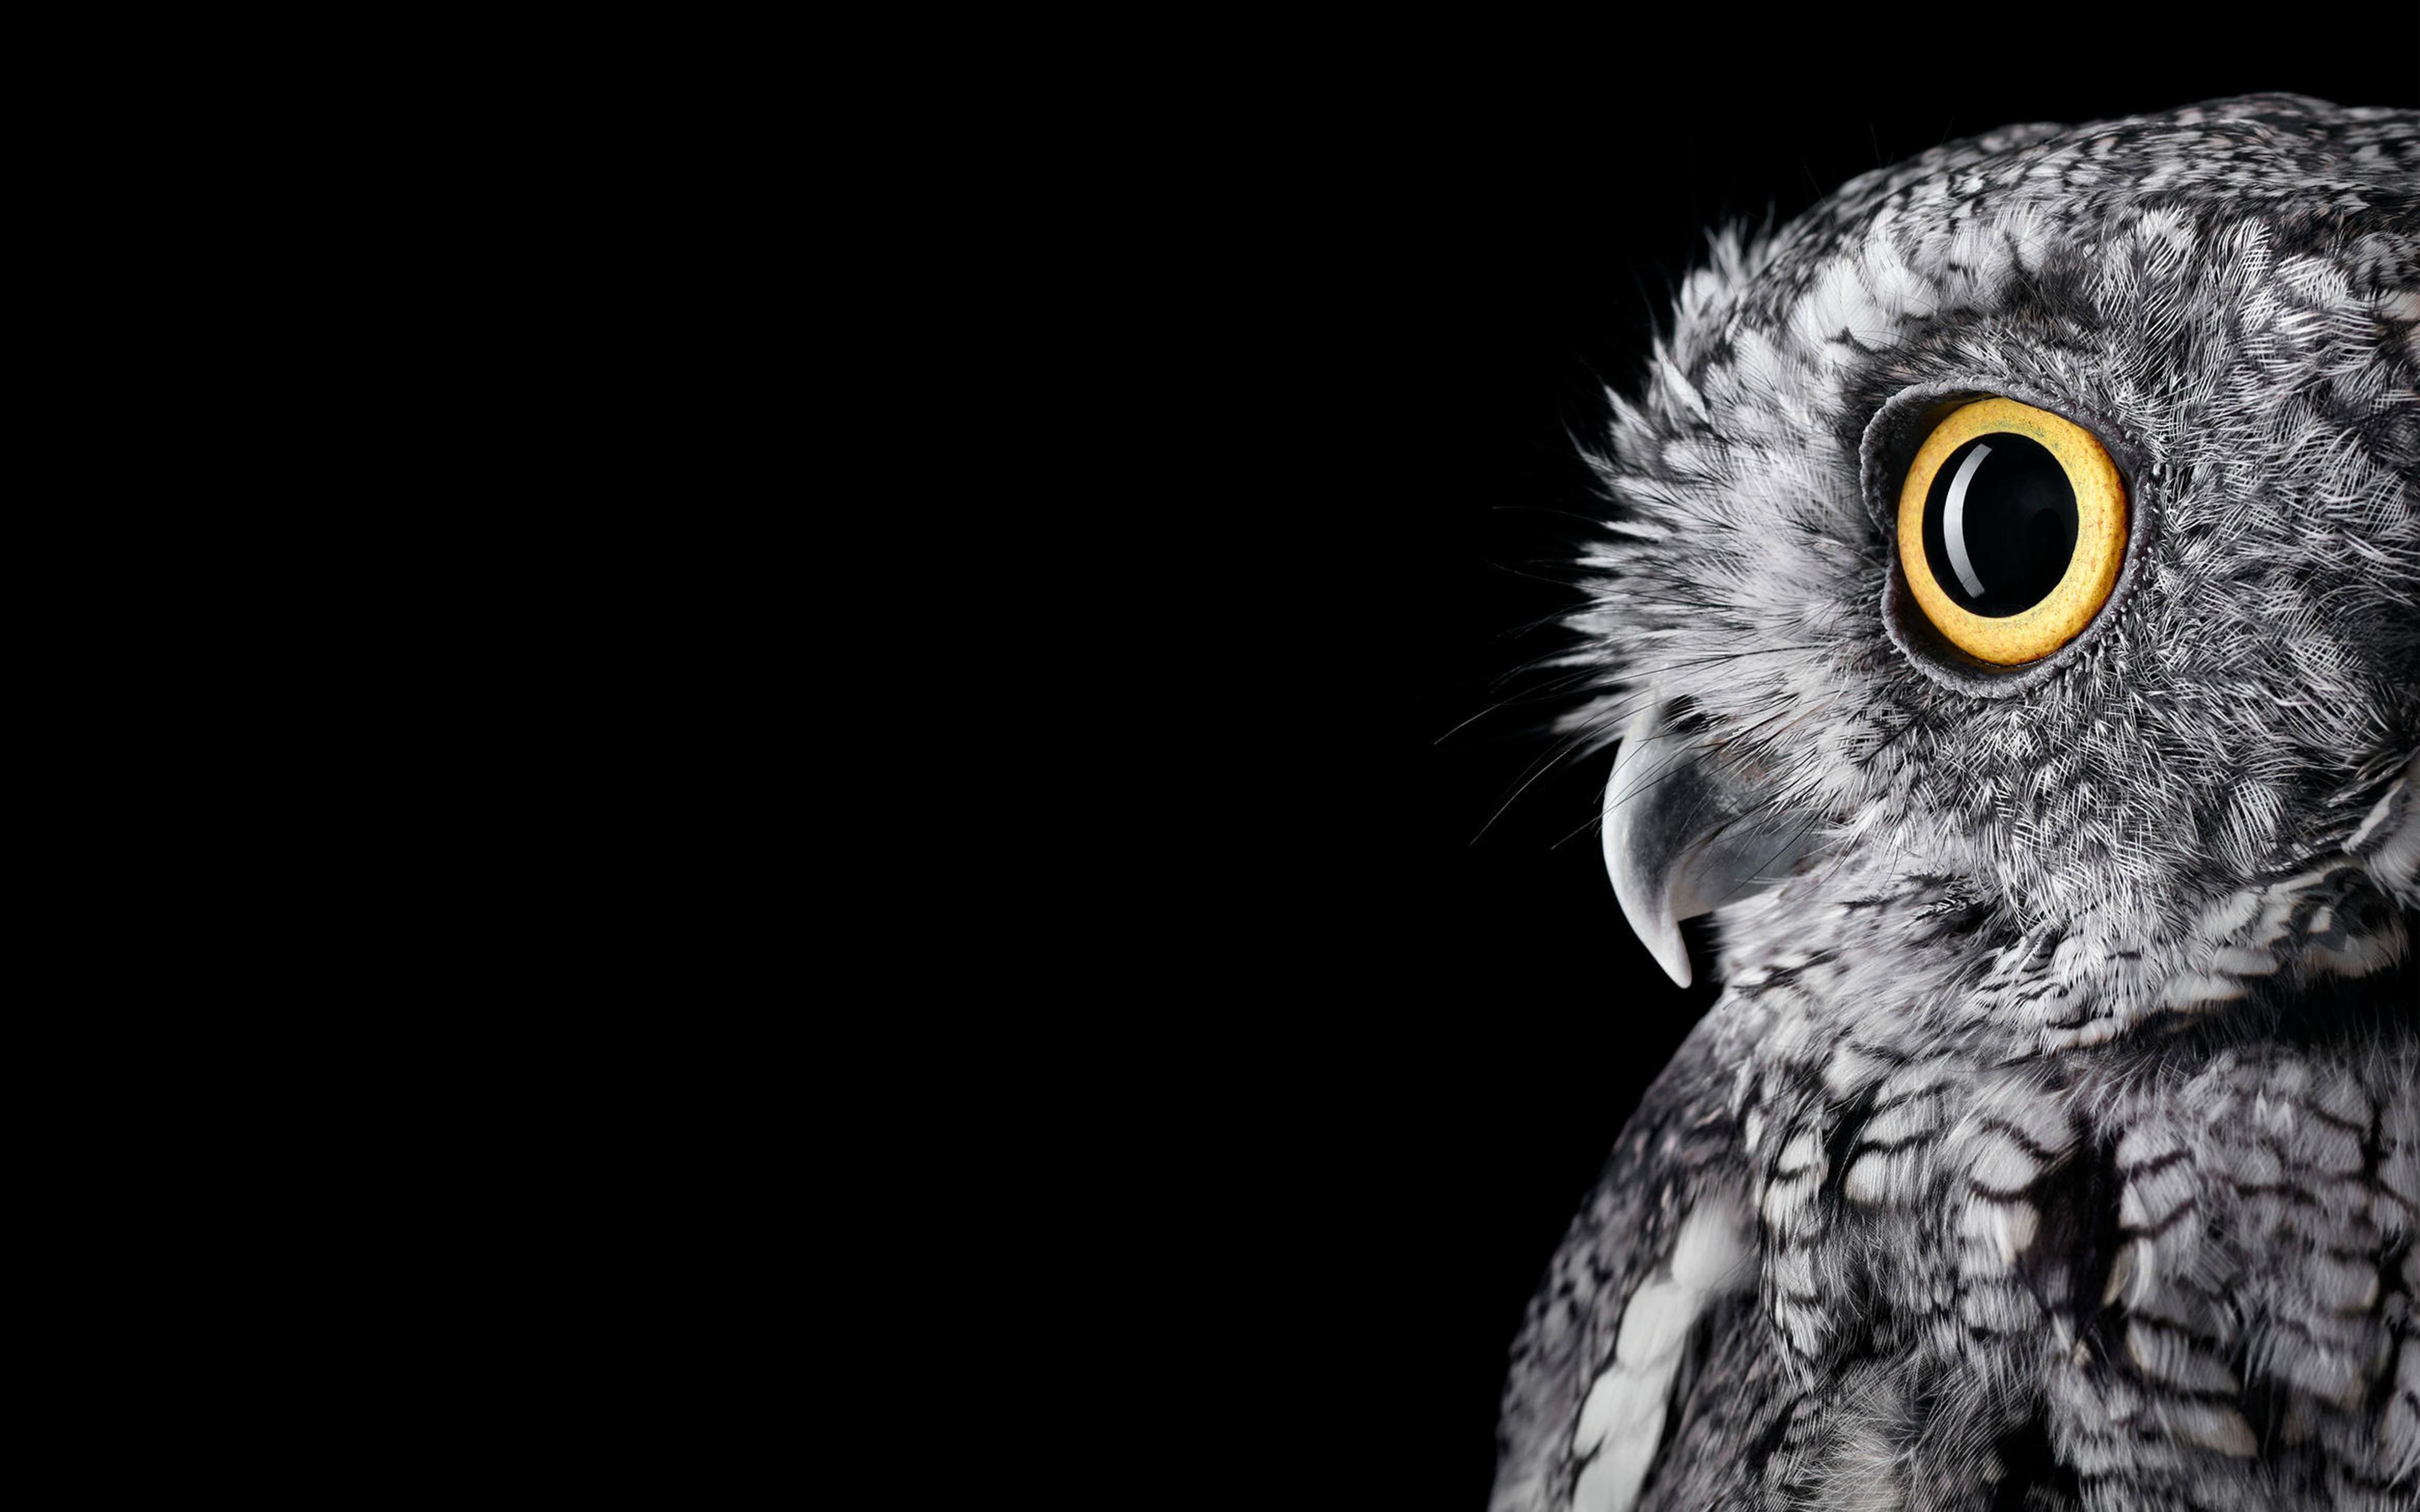 Wallpaper Owl 4K 5K Macaws